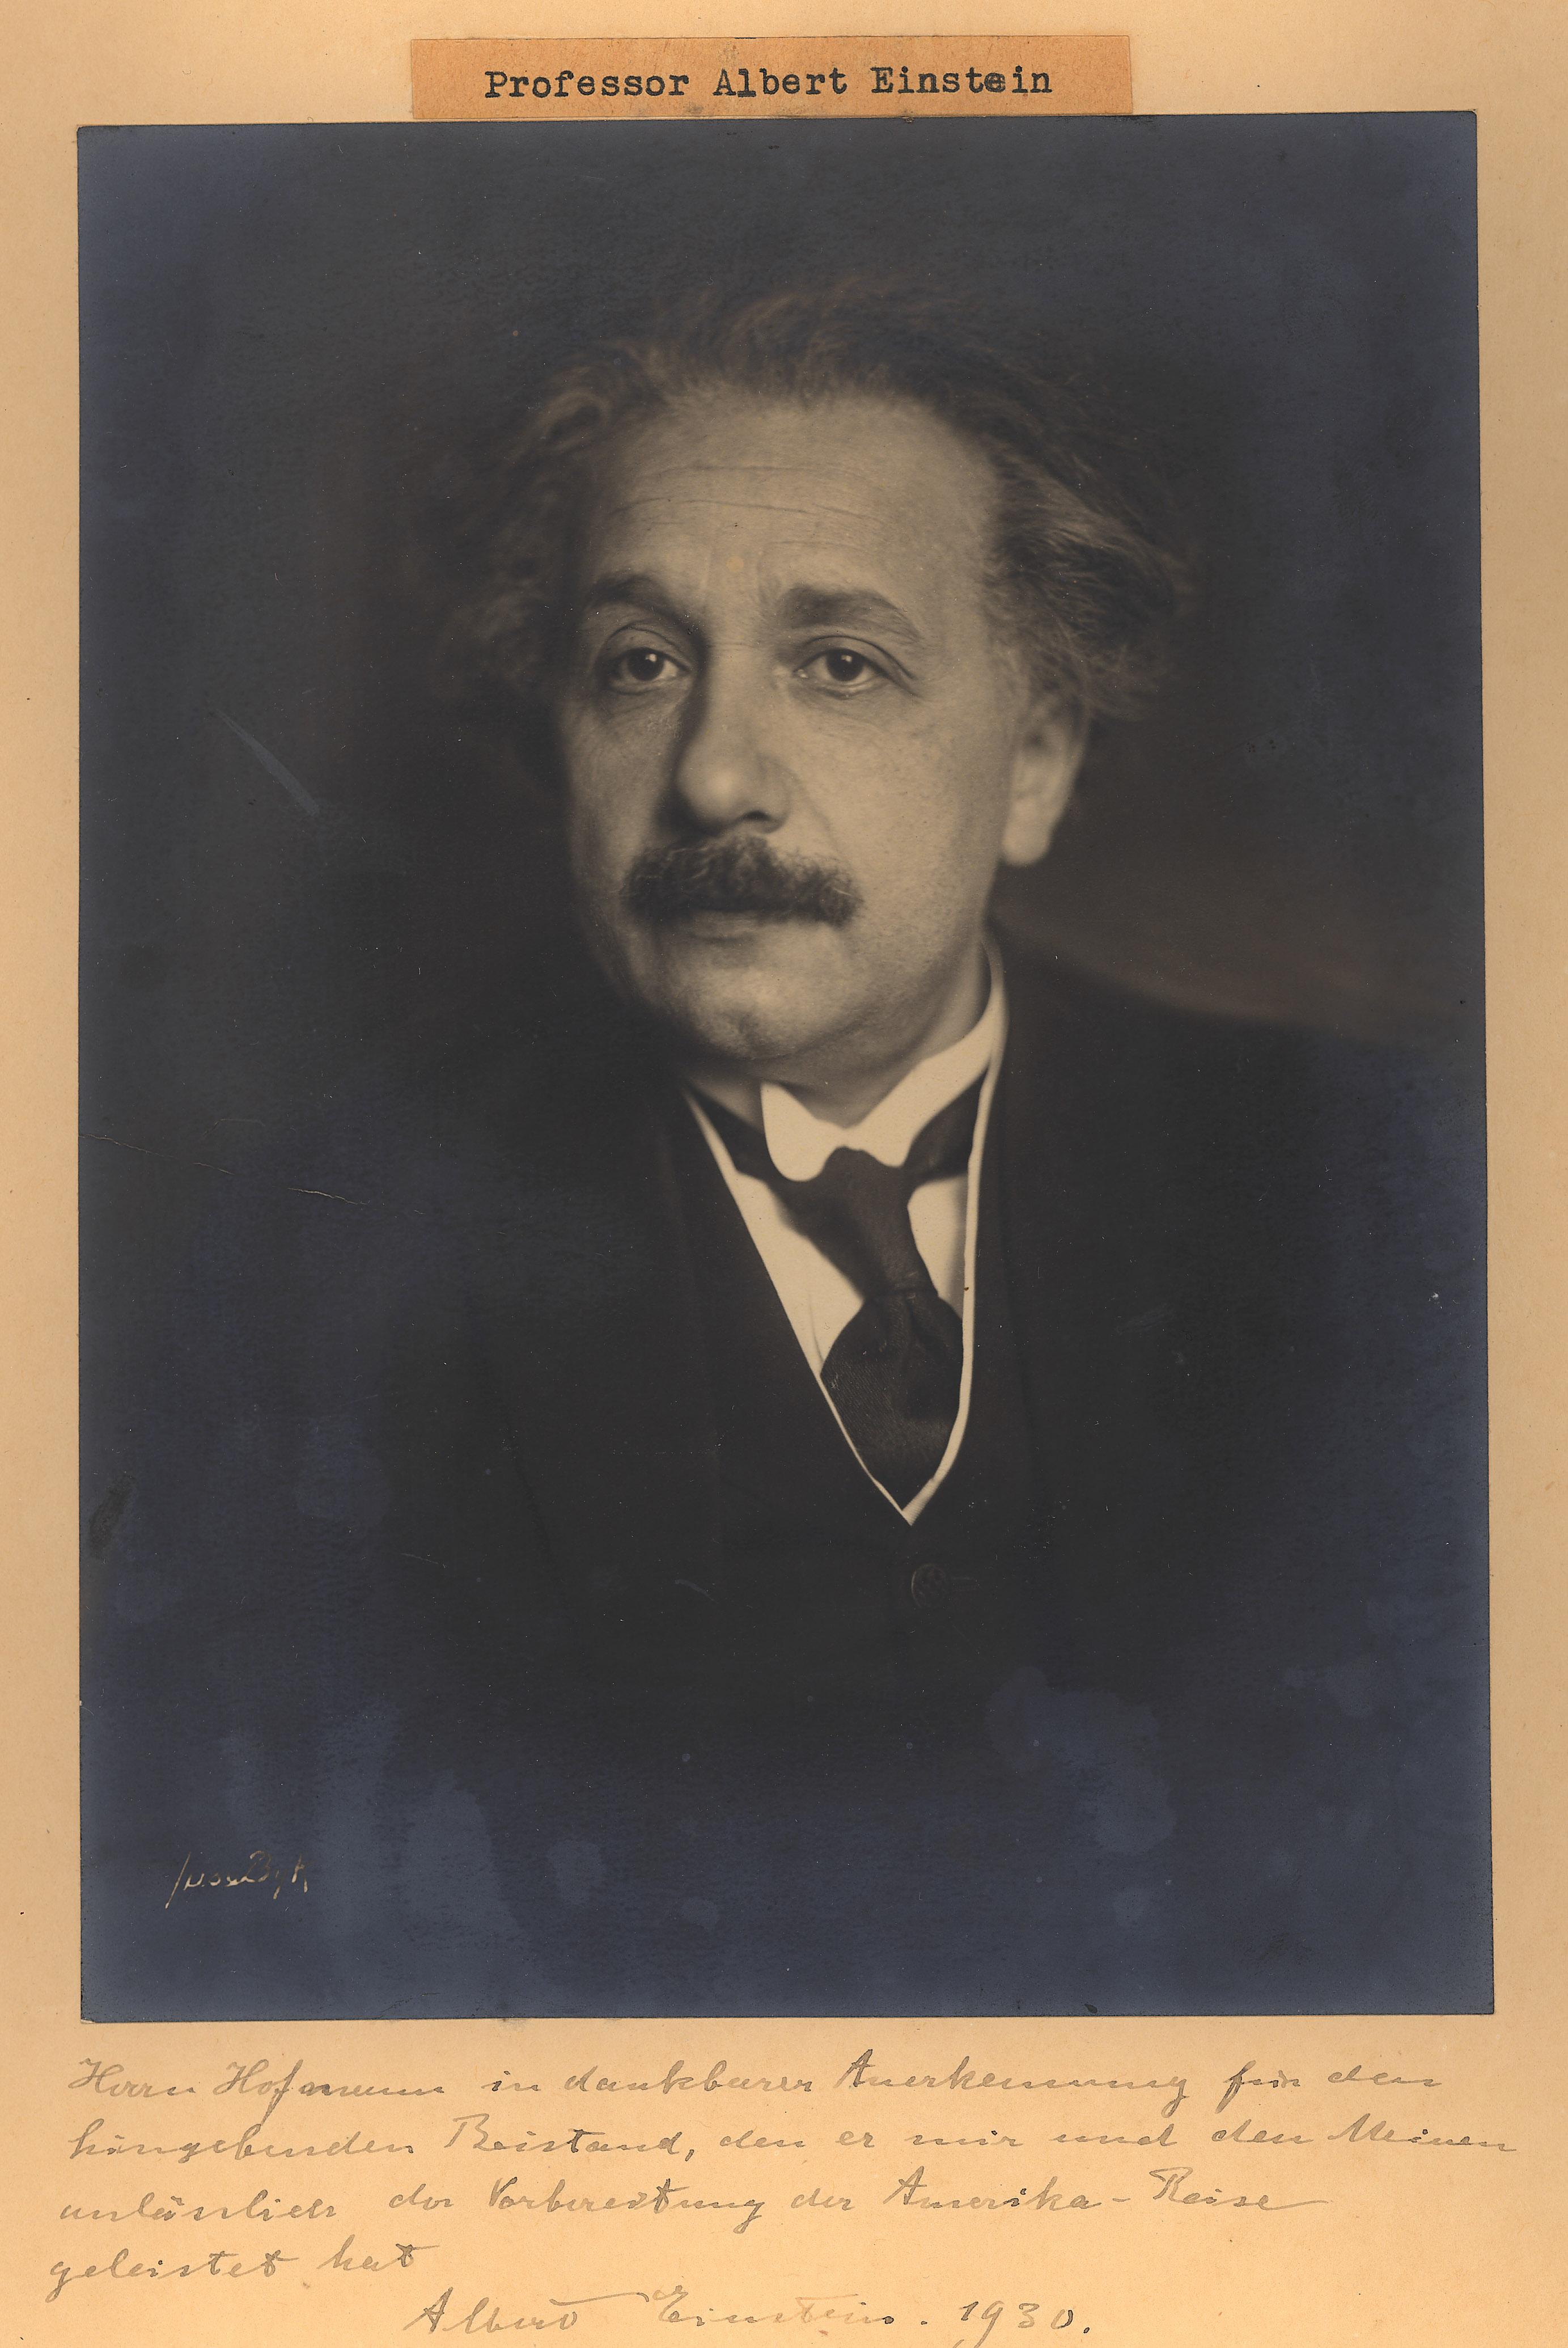 Portrait of Albert Einstein,  Image number:SIL14-E1-05a